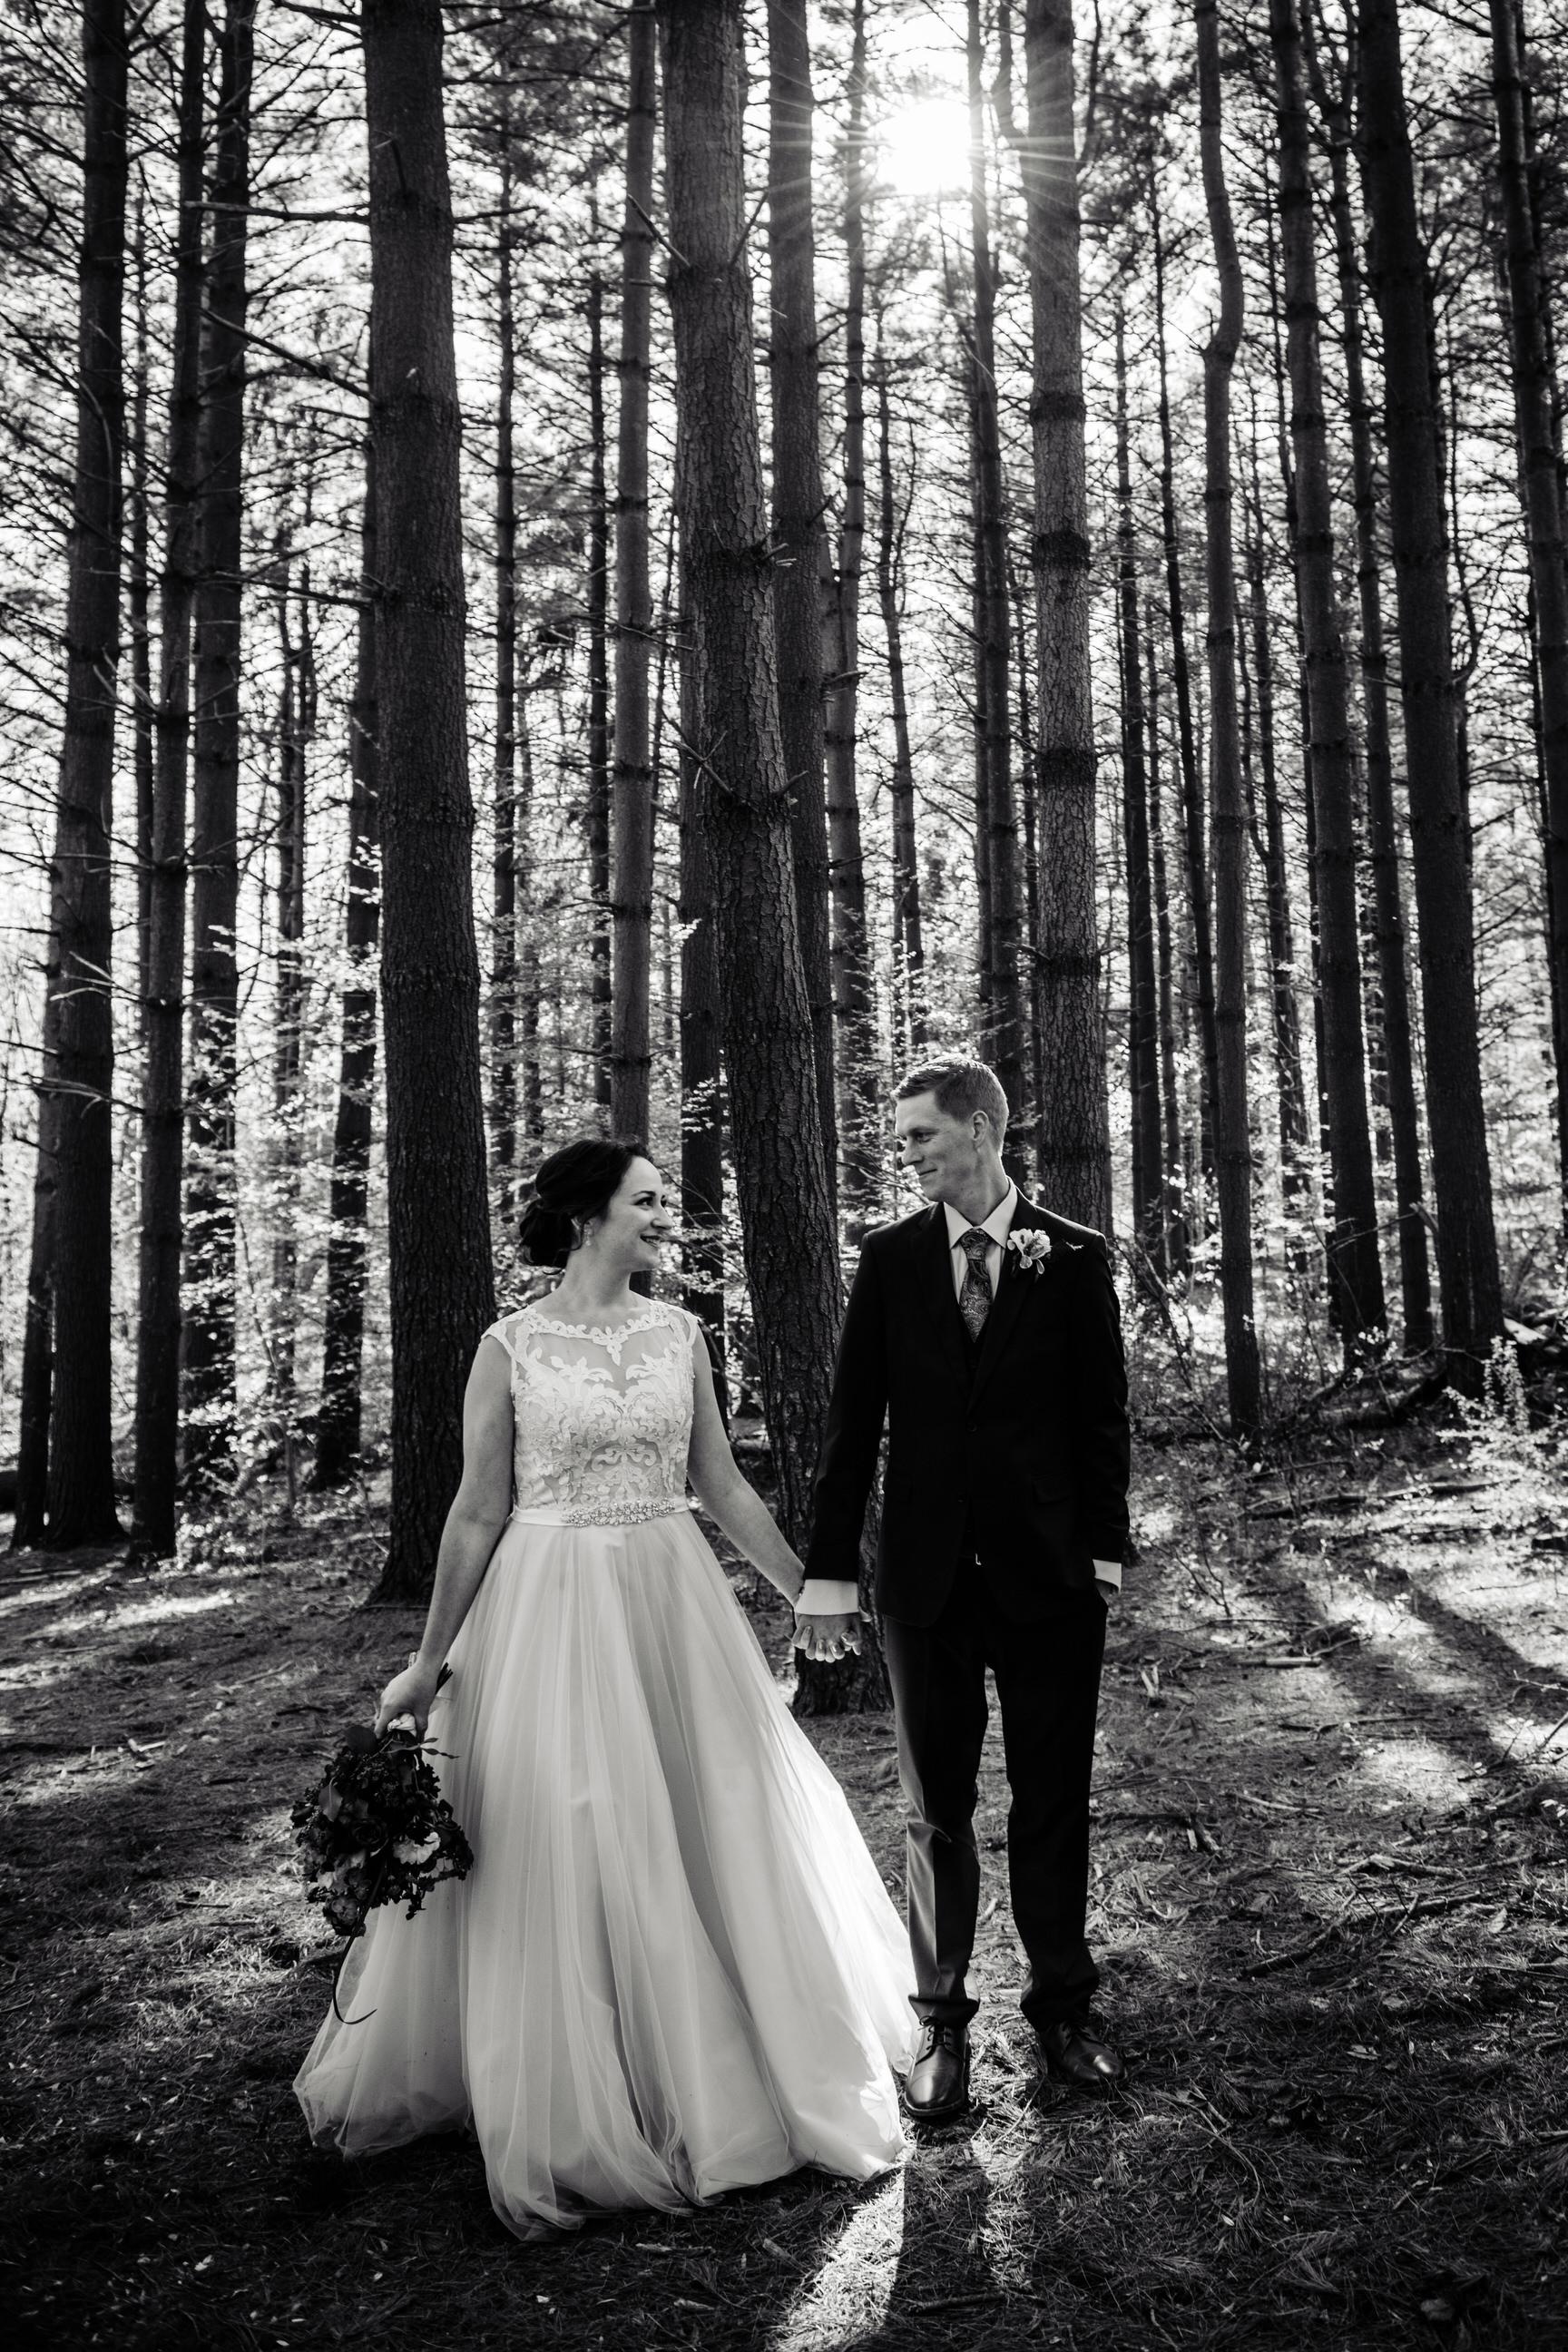 ThorpewoodWedding-Eileen&Chris-5908.jpg